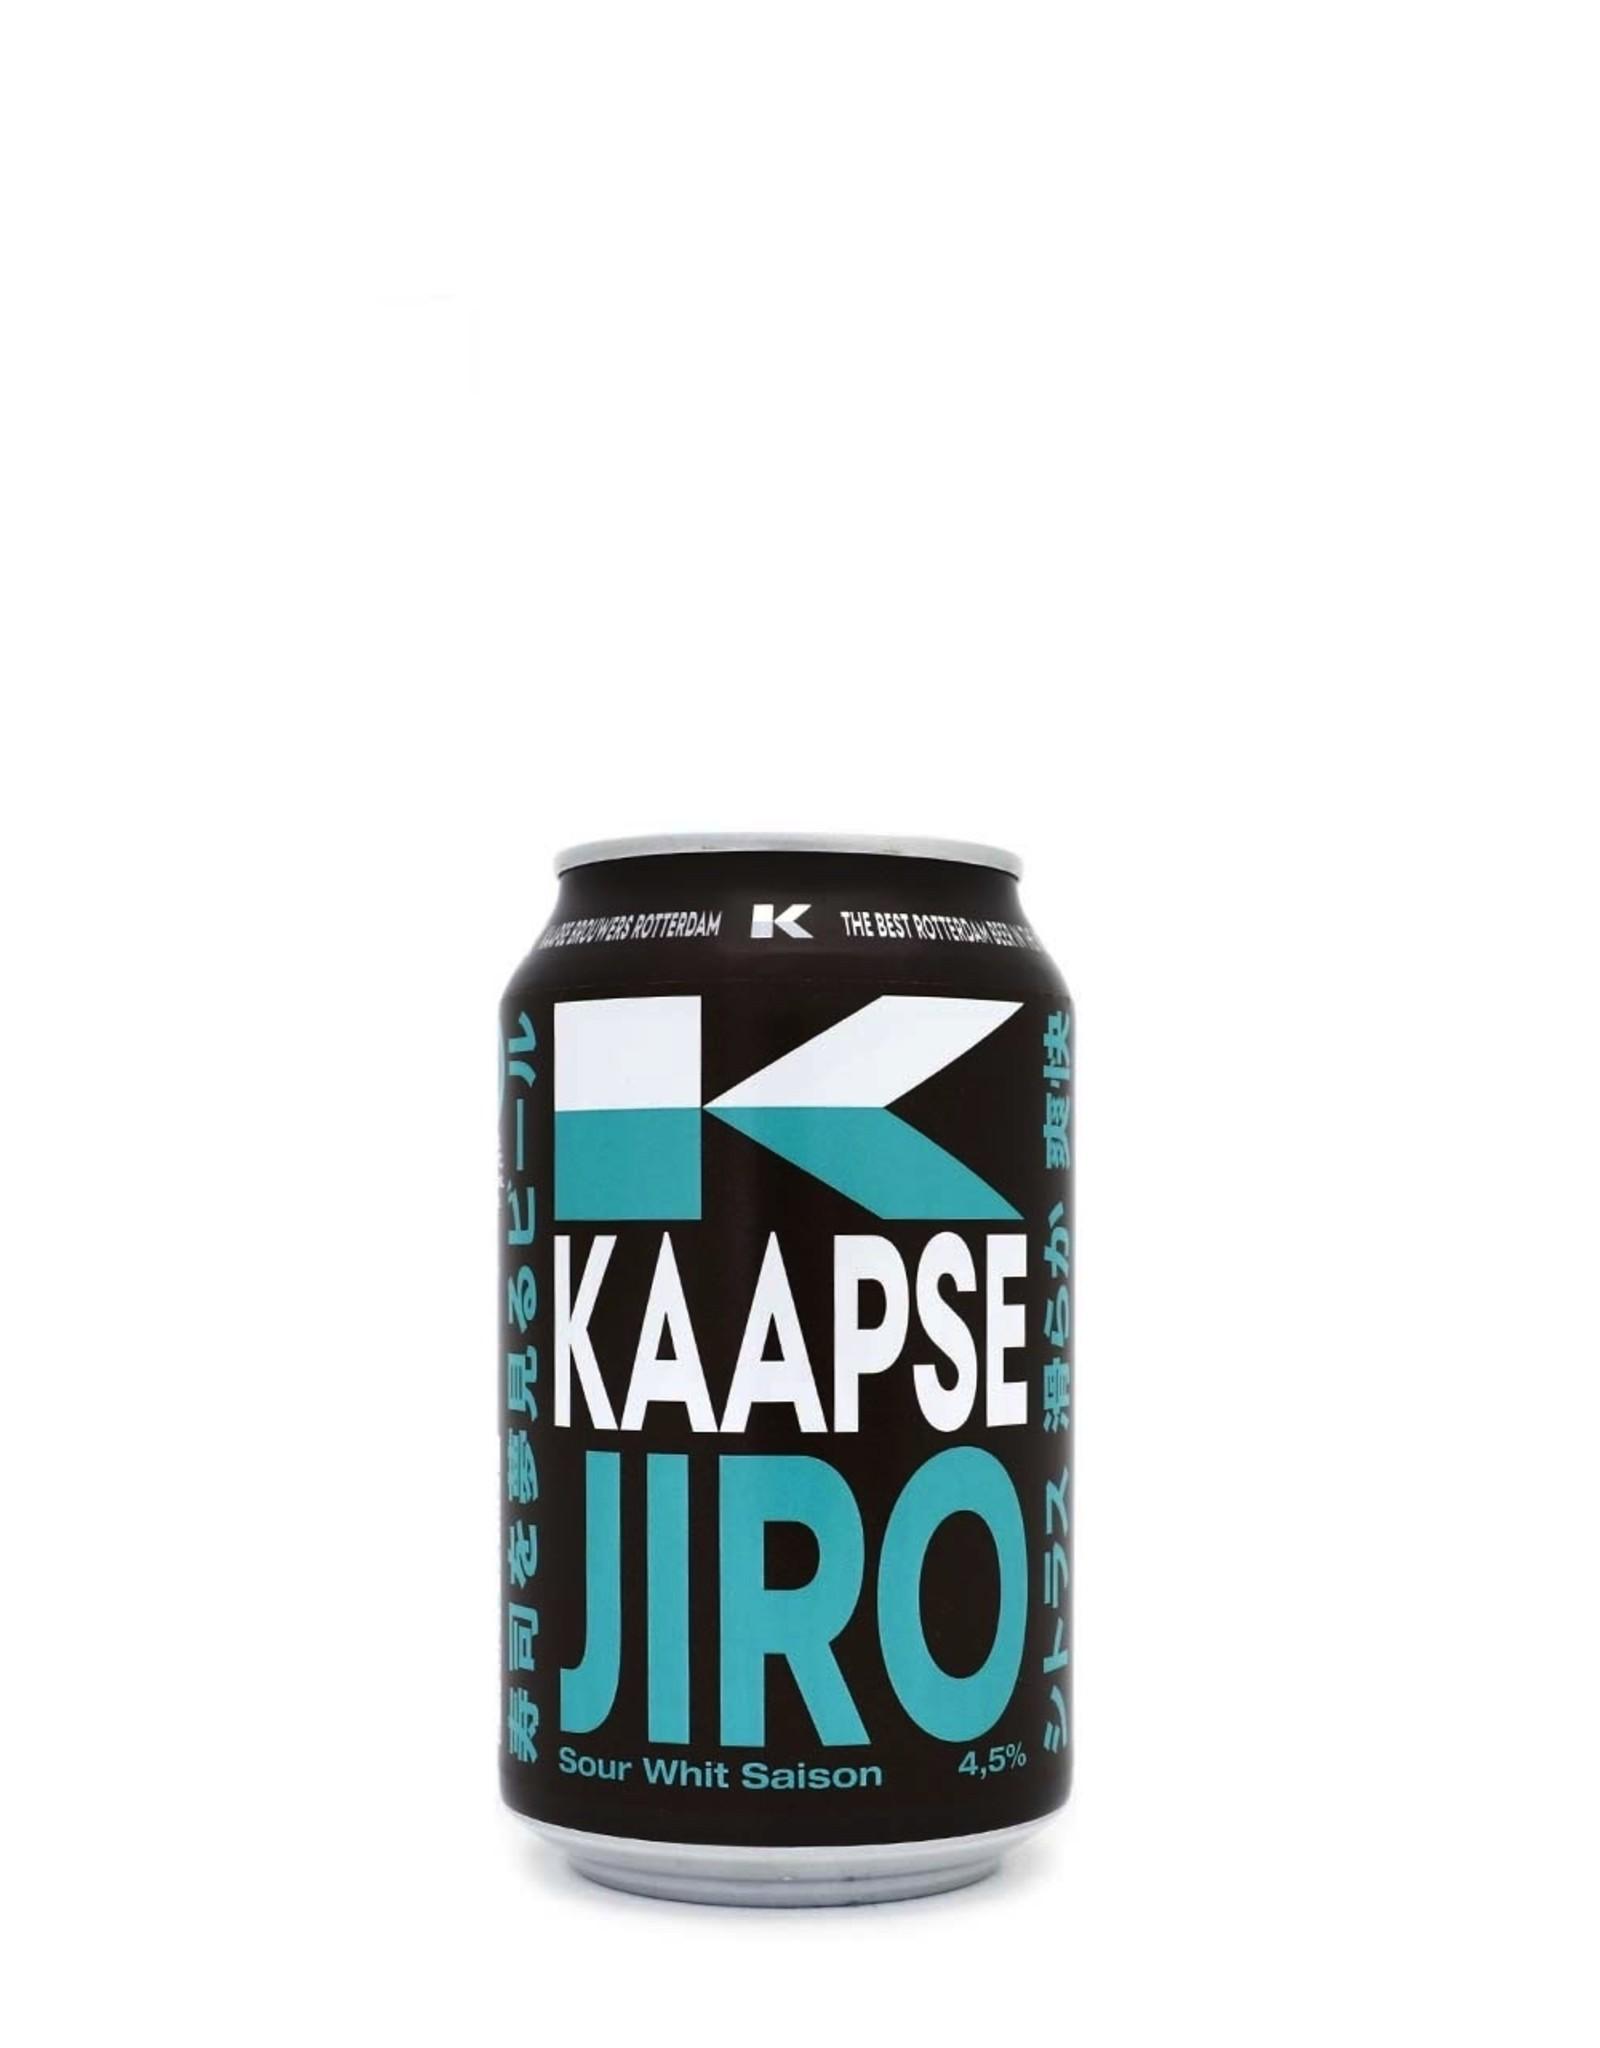 Kaapse - Jiro 33cl